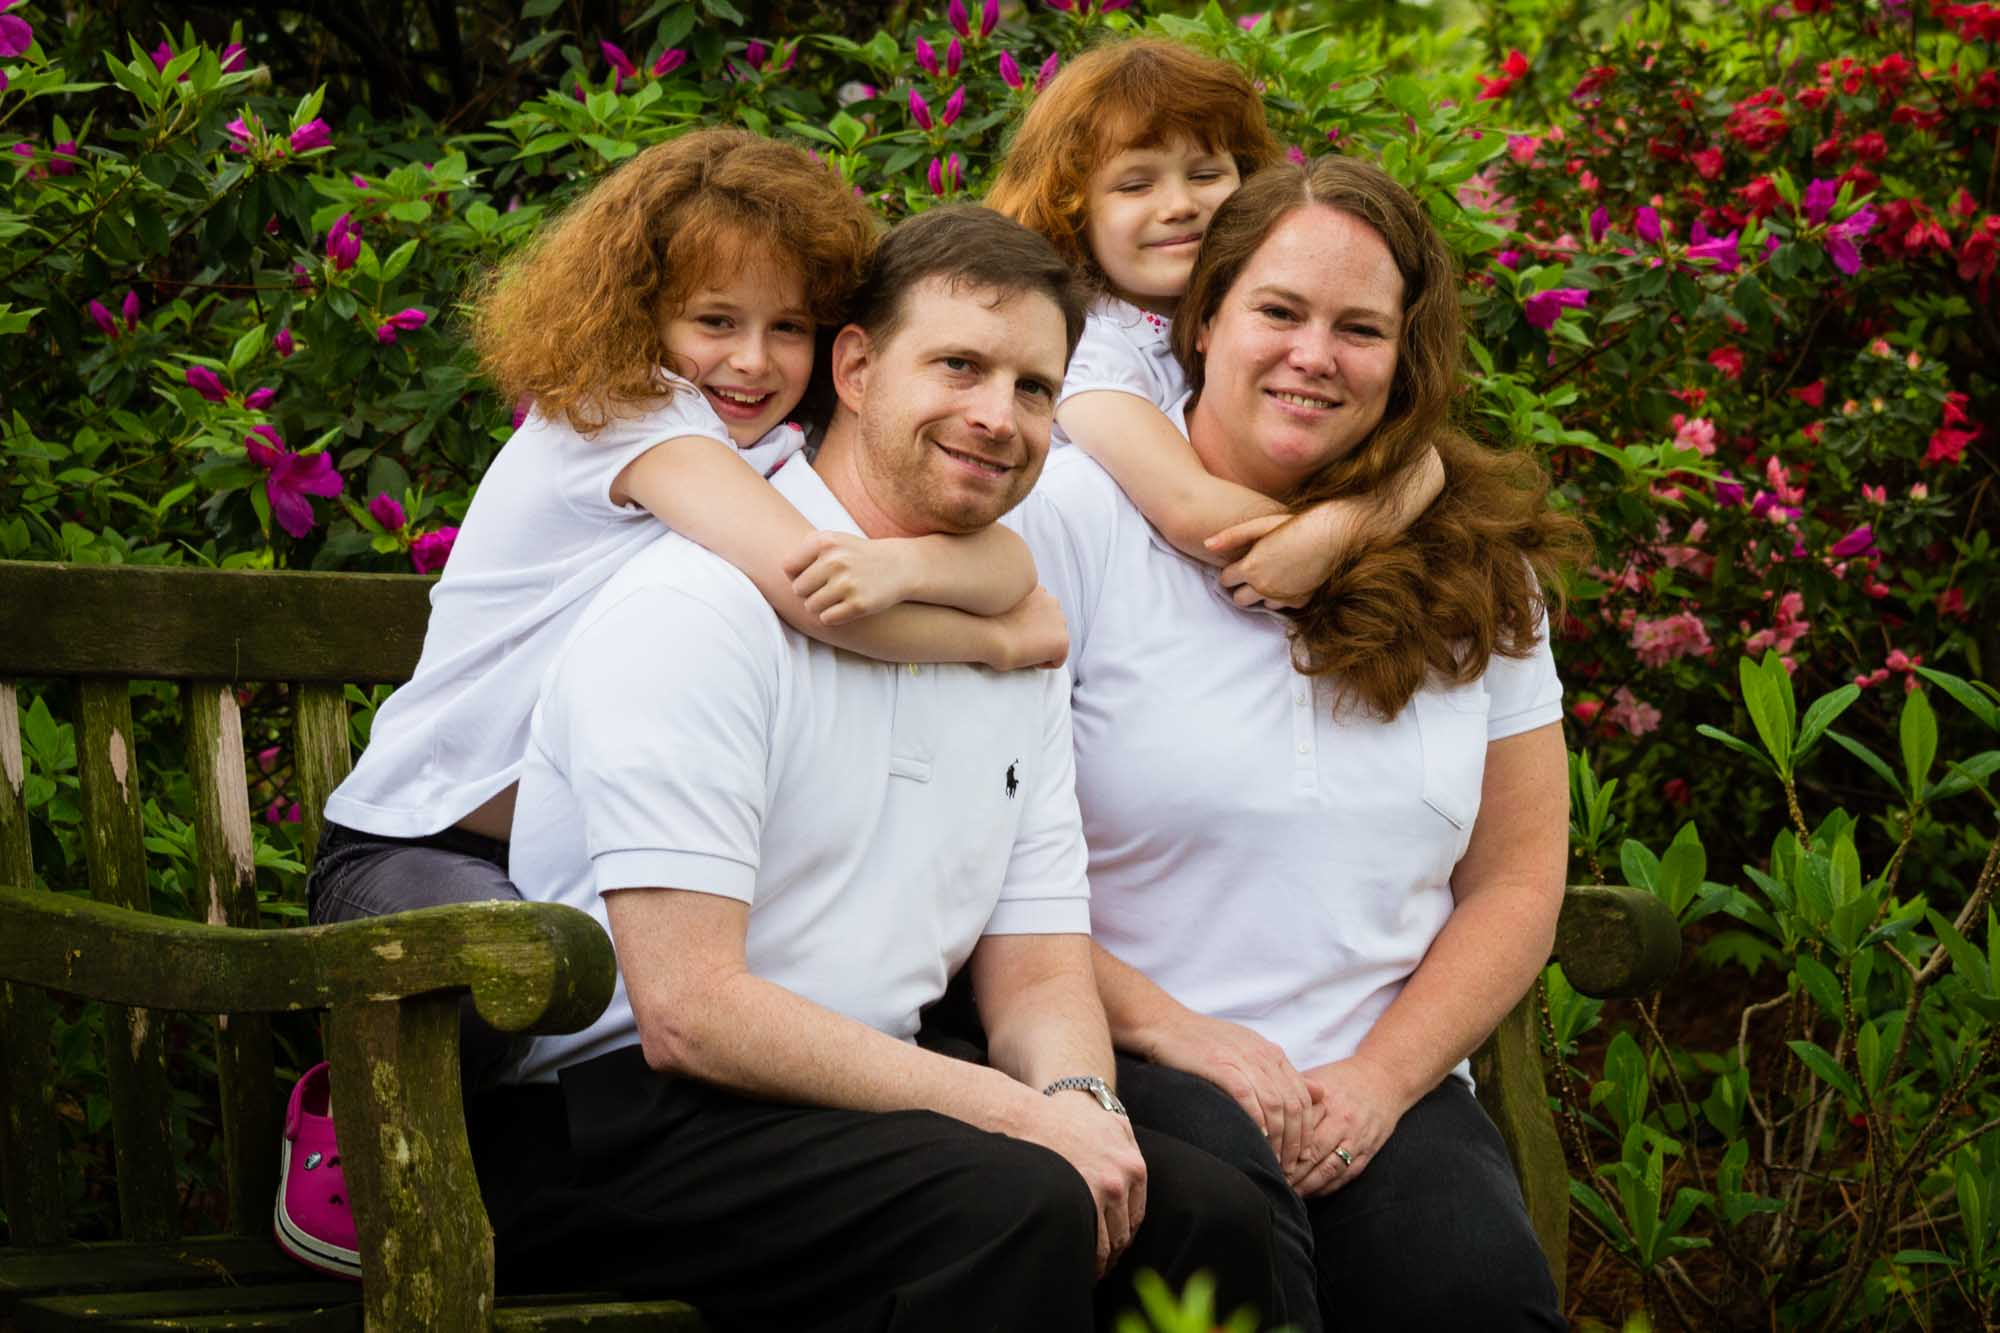 028-Underwood Family.jpg